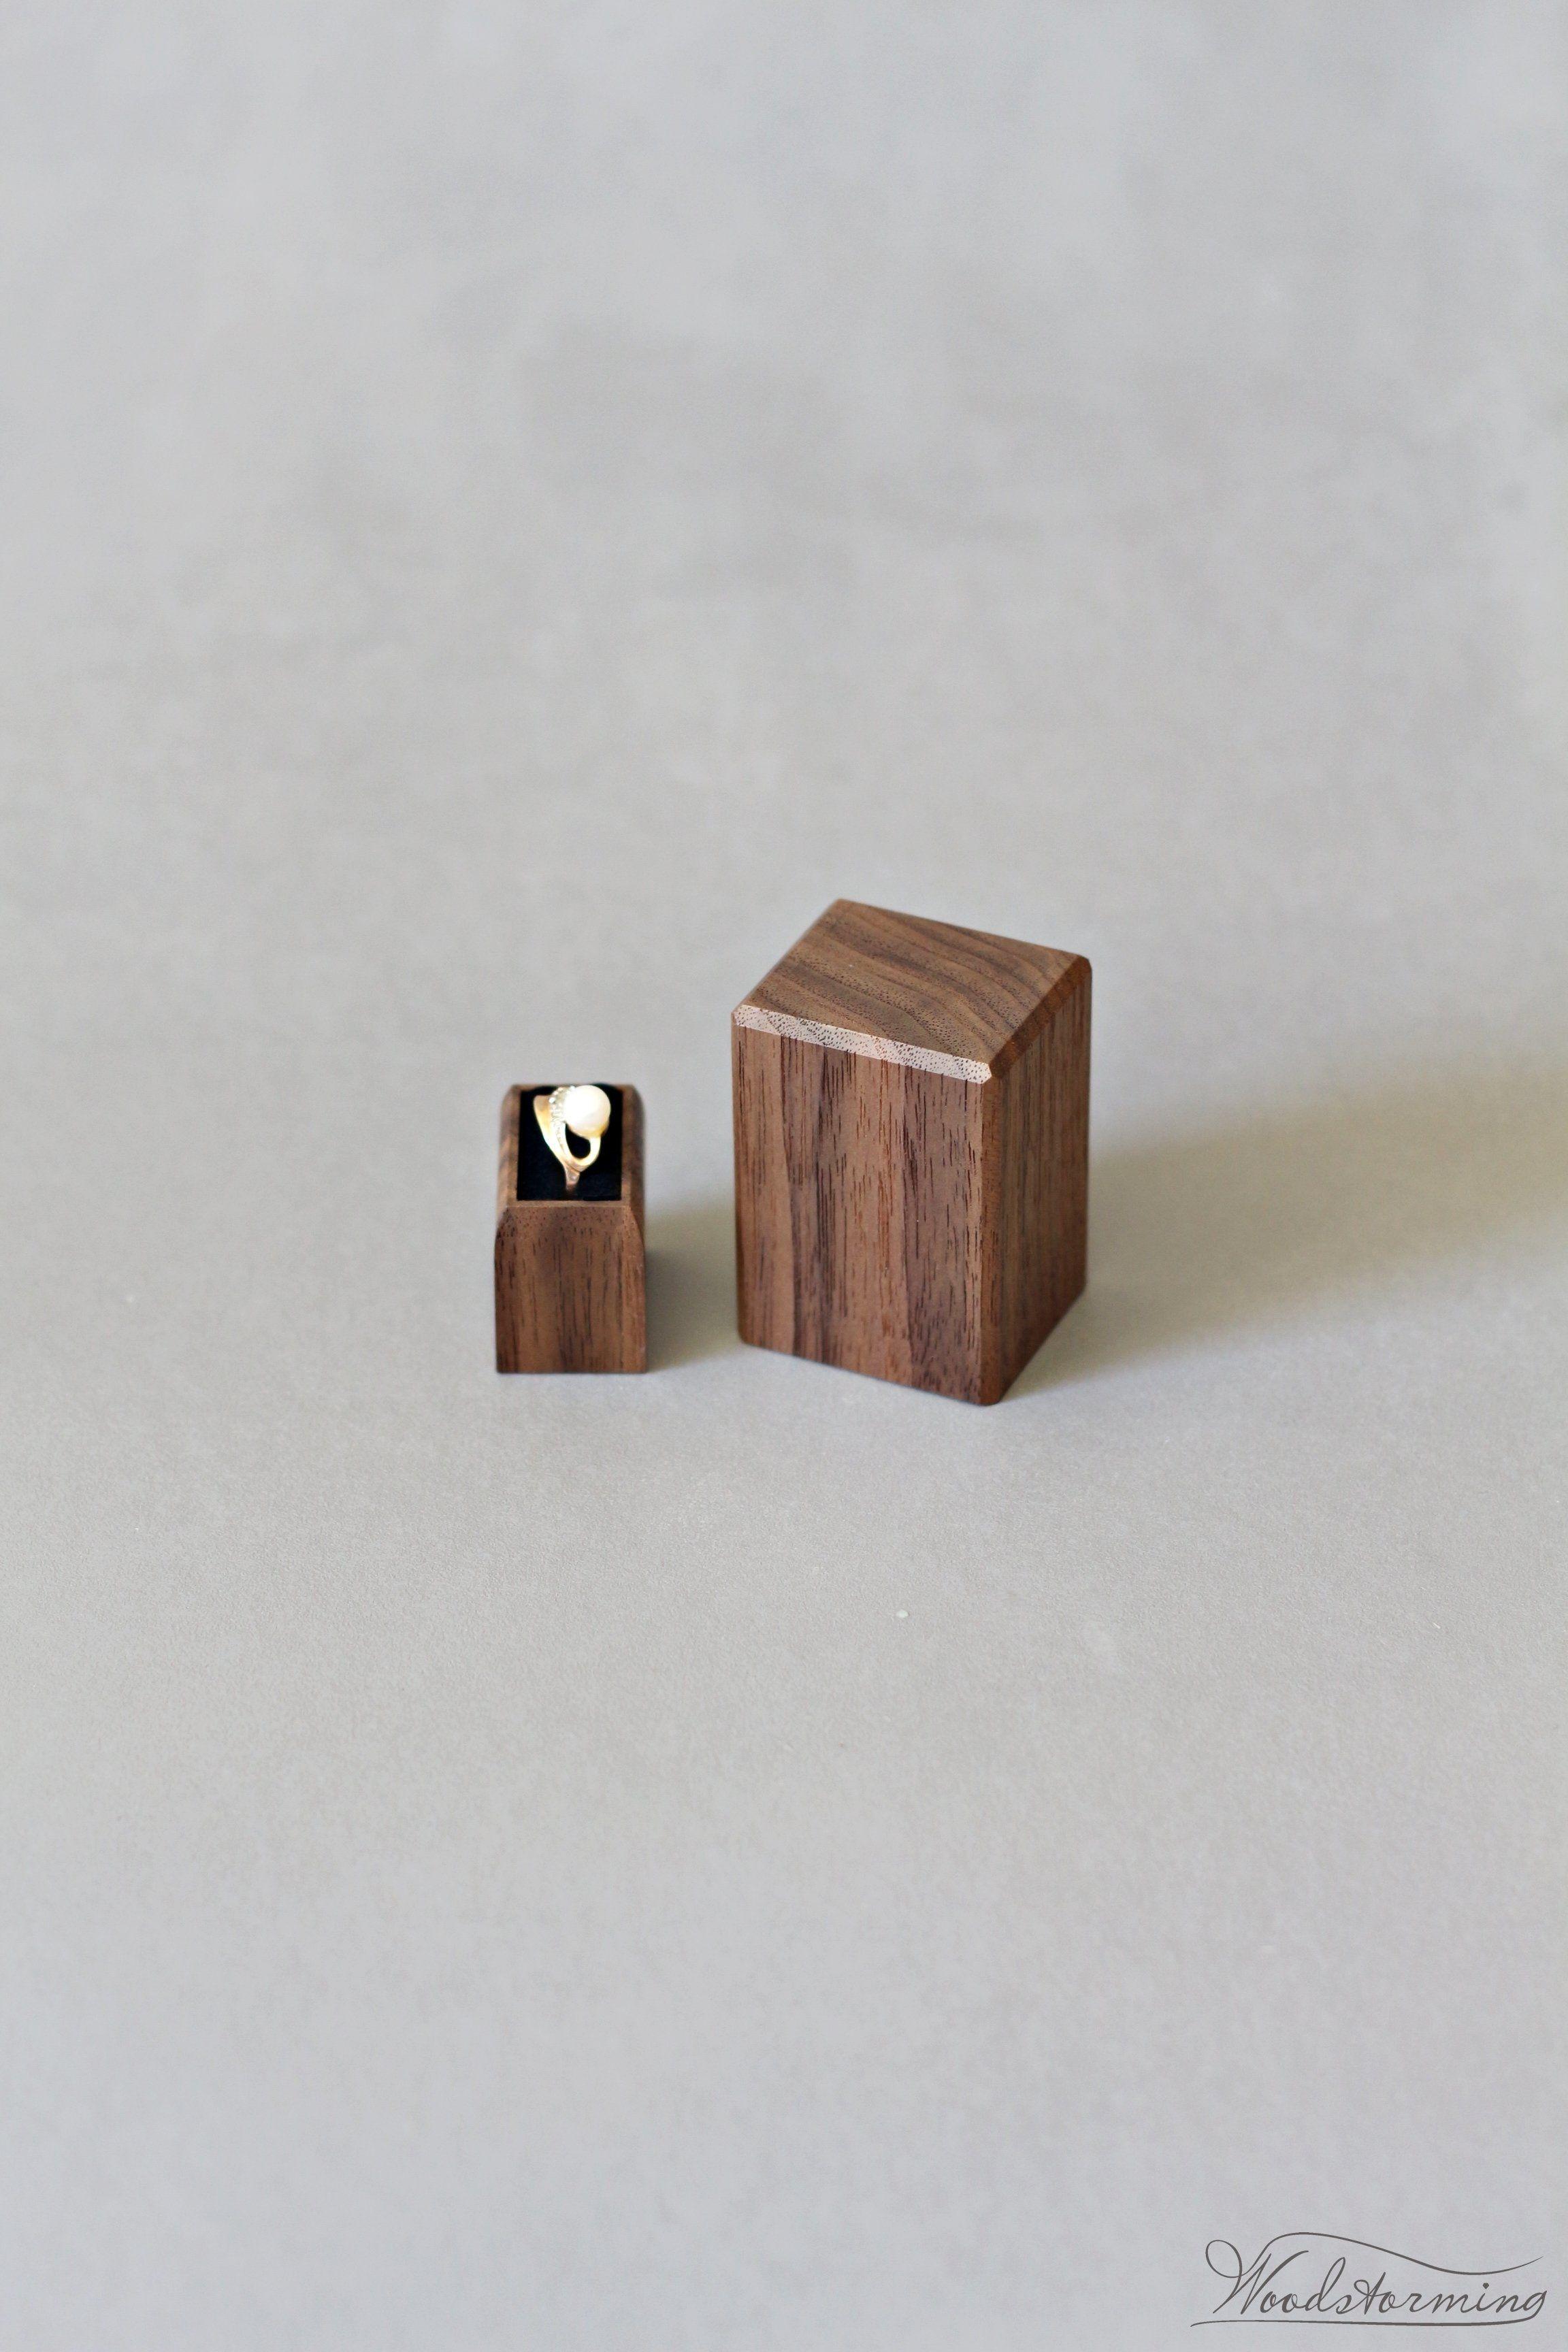 Wood Engagement Ring Box Proposal Ring Holder Minimalist Ring Display Wood Ring Box Engagement Engagement Ring Box Proposals Engagement Ring Box